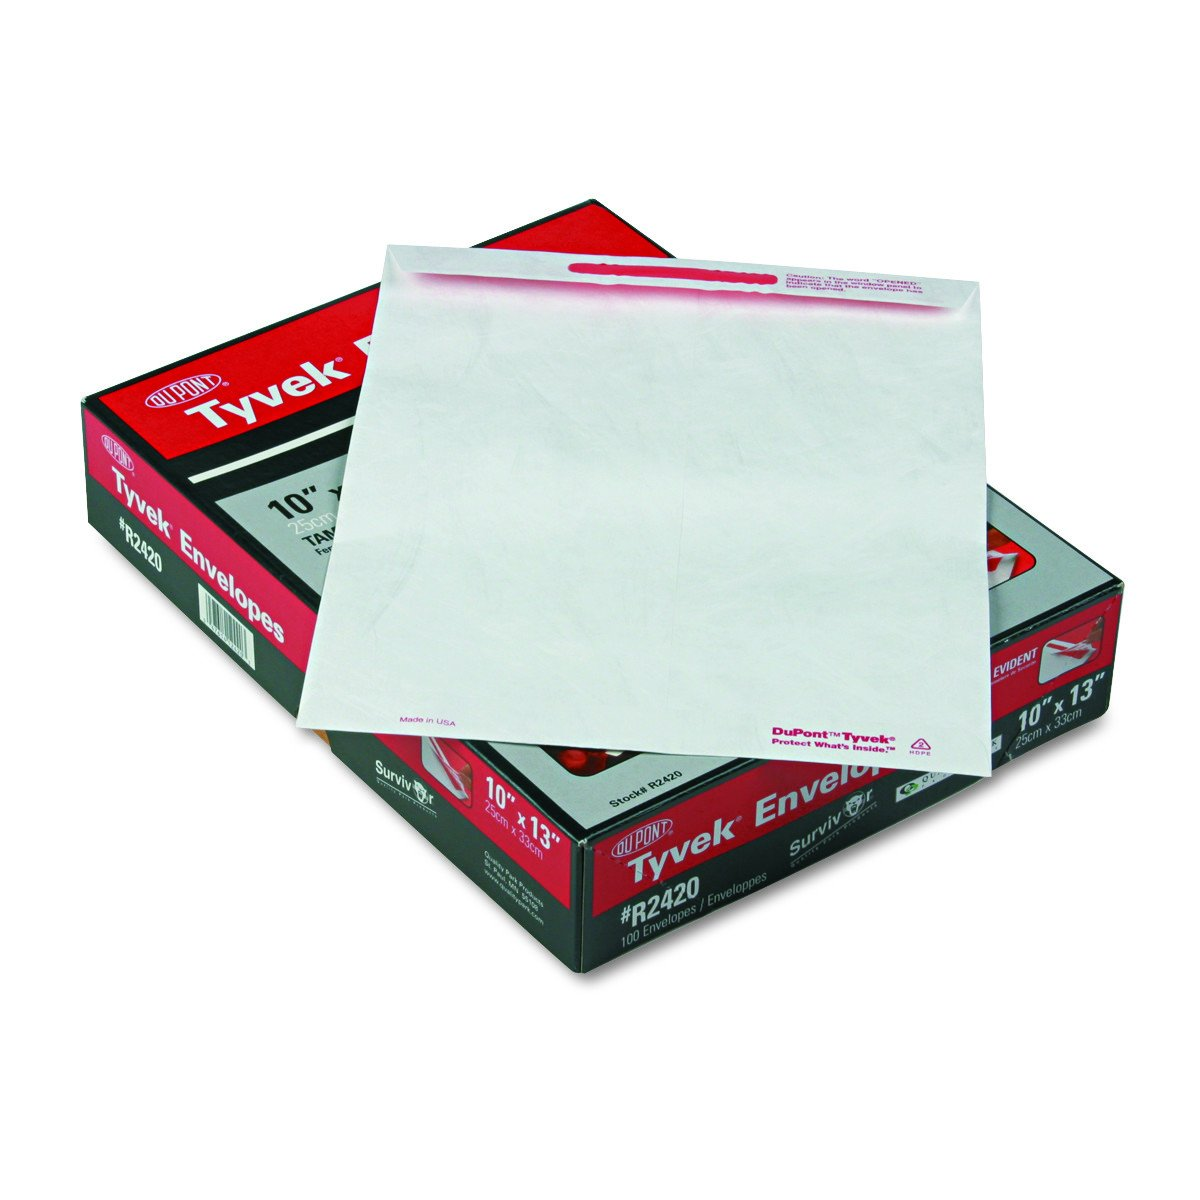 Quality Park R2420 Advantage Flap Stik Tyvek Mailer, 10 x 13, White (Box of 100)